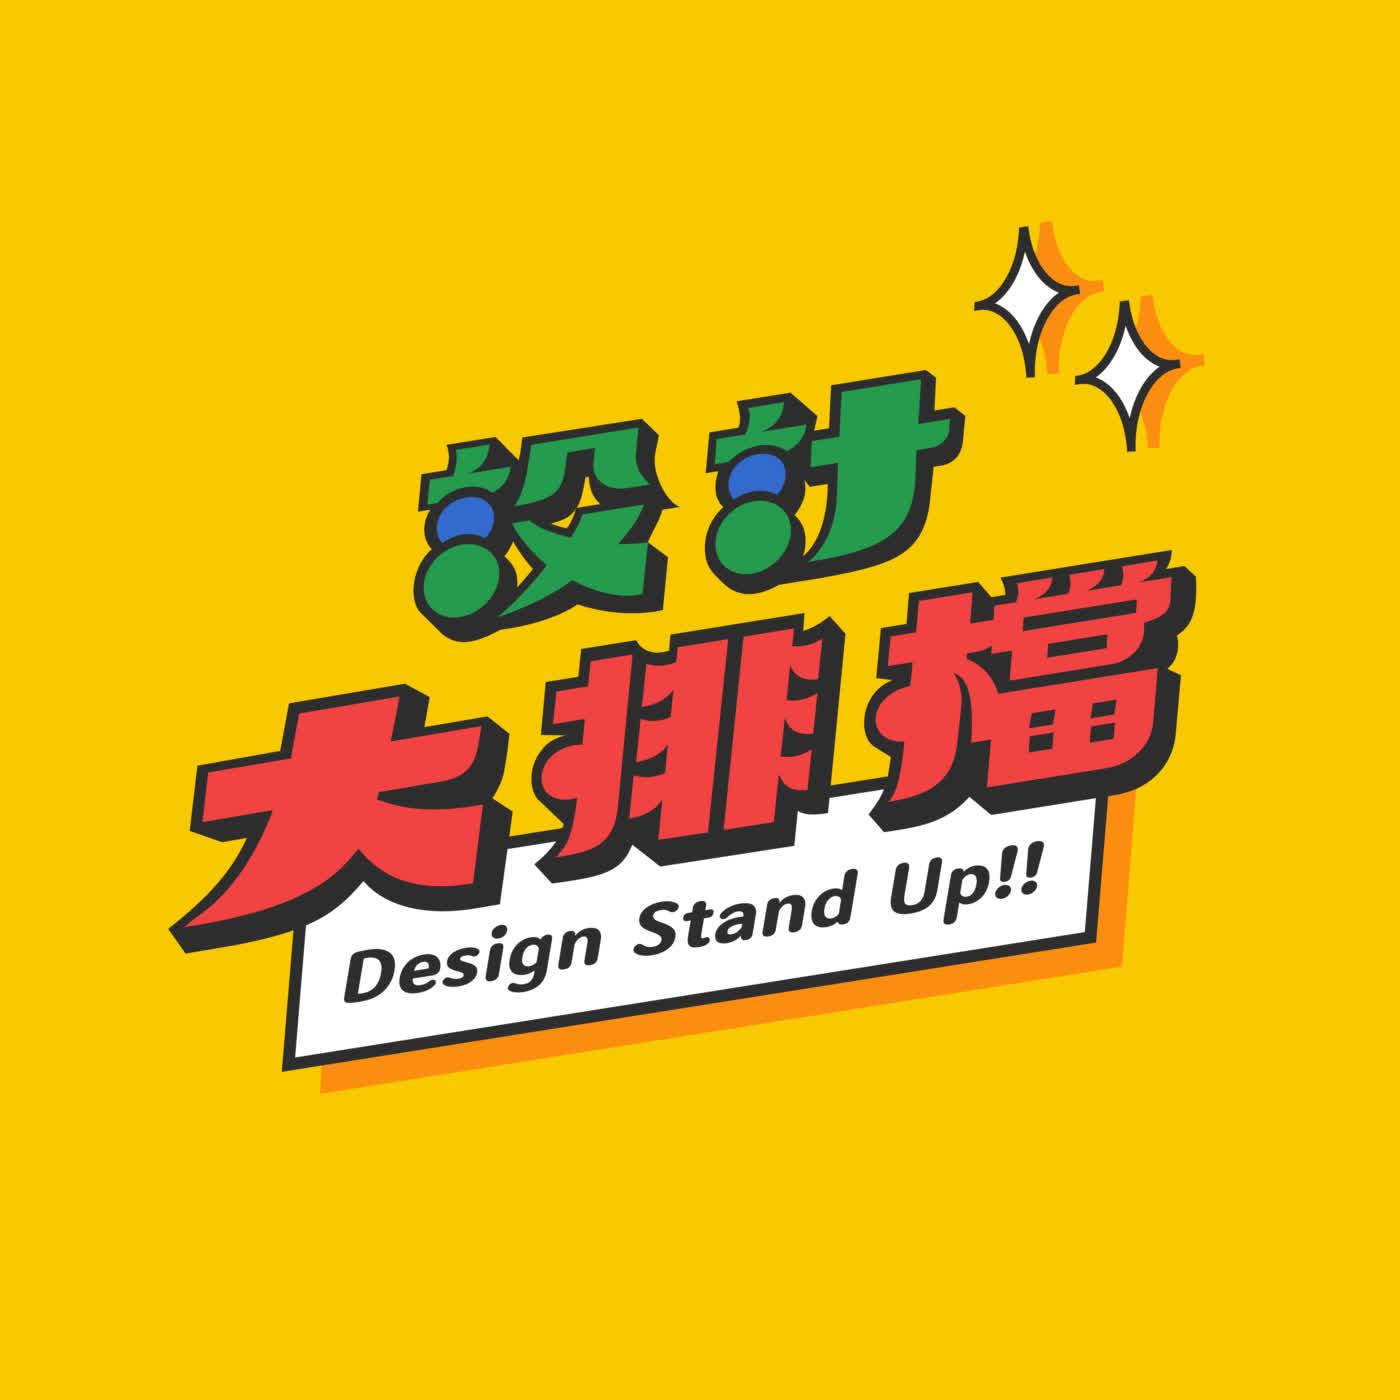 EP18|沒時間解釋了~ 年會列車要開了!!  前往IxDTW 2021的旅客請趕快上車🚂 feat. IxDA Taiwan